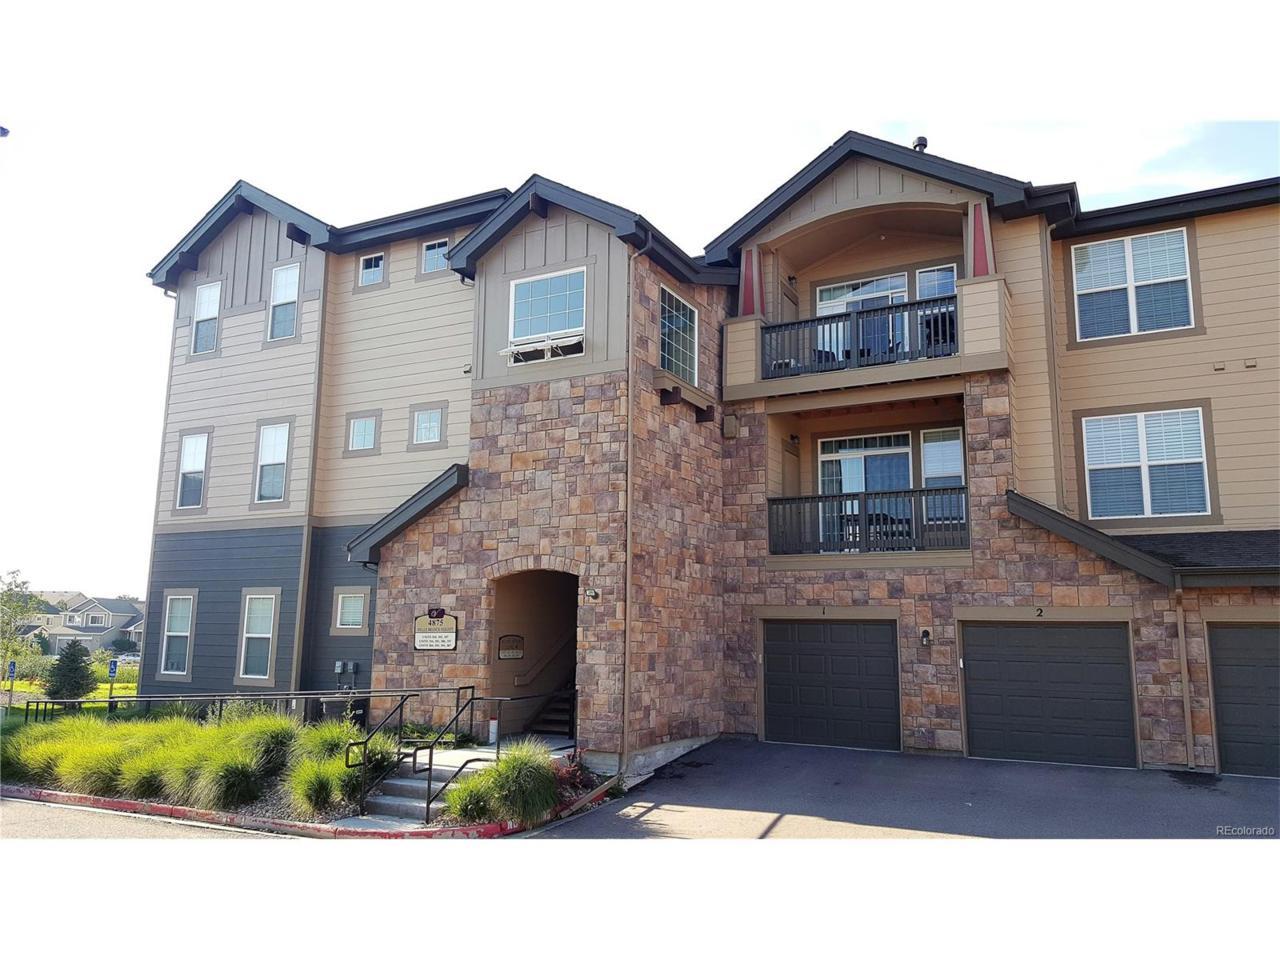 4875 Wells Branch Heights #204, Colorado Springs, CO 80923 (MLS #6810283) :: 8z Real Estate